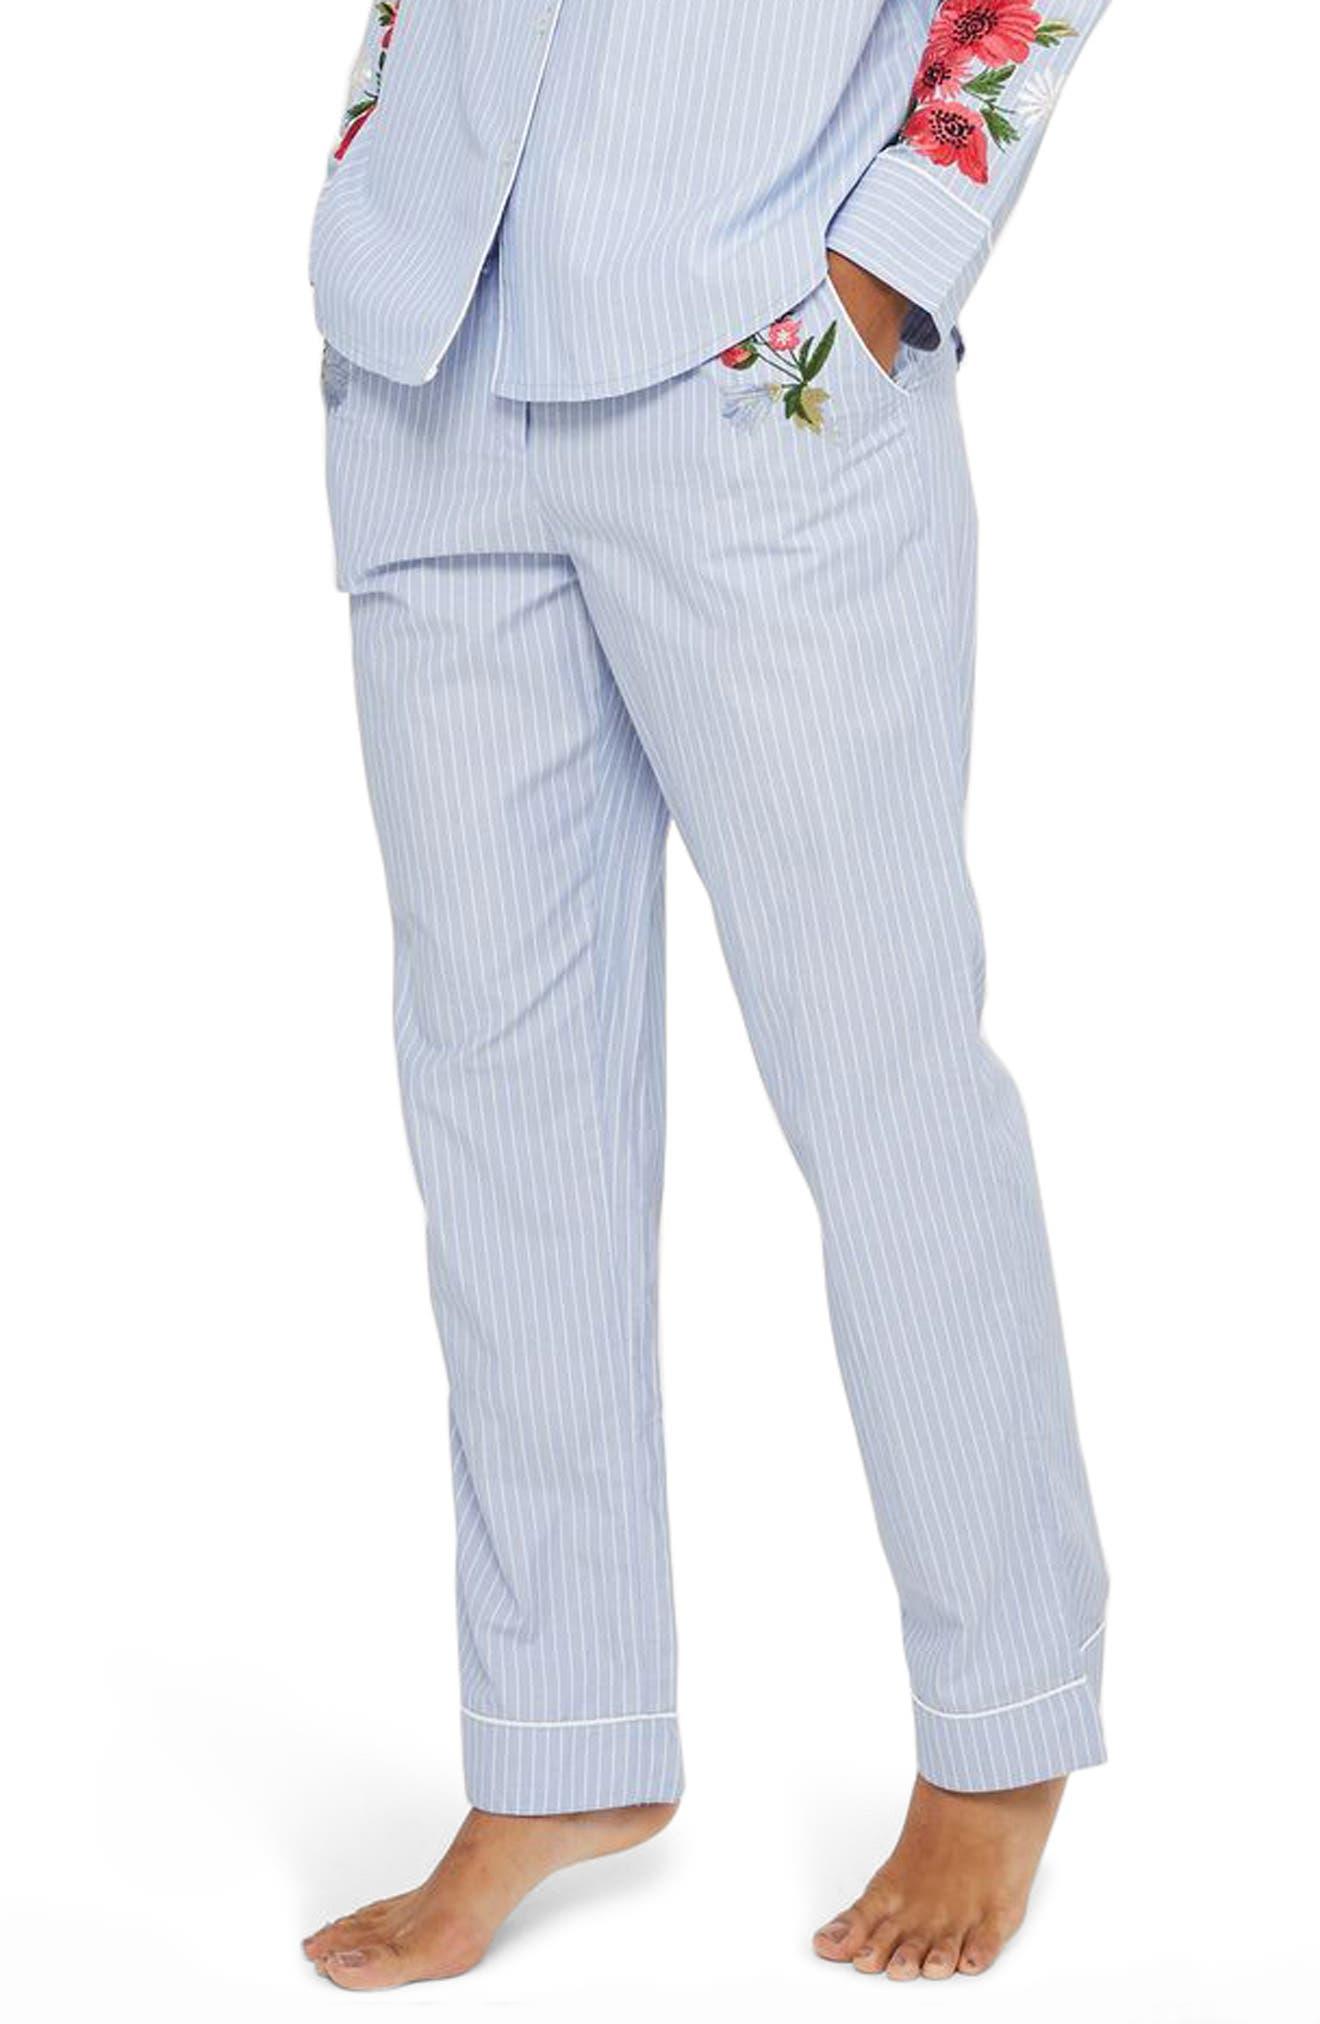 Alternate Image 1 Selected - Topshop Floral Embroidered Stripe Pajama Pants